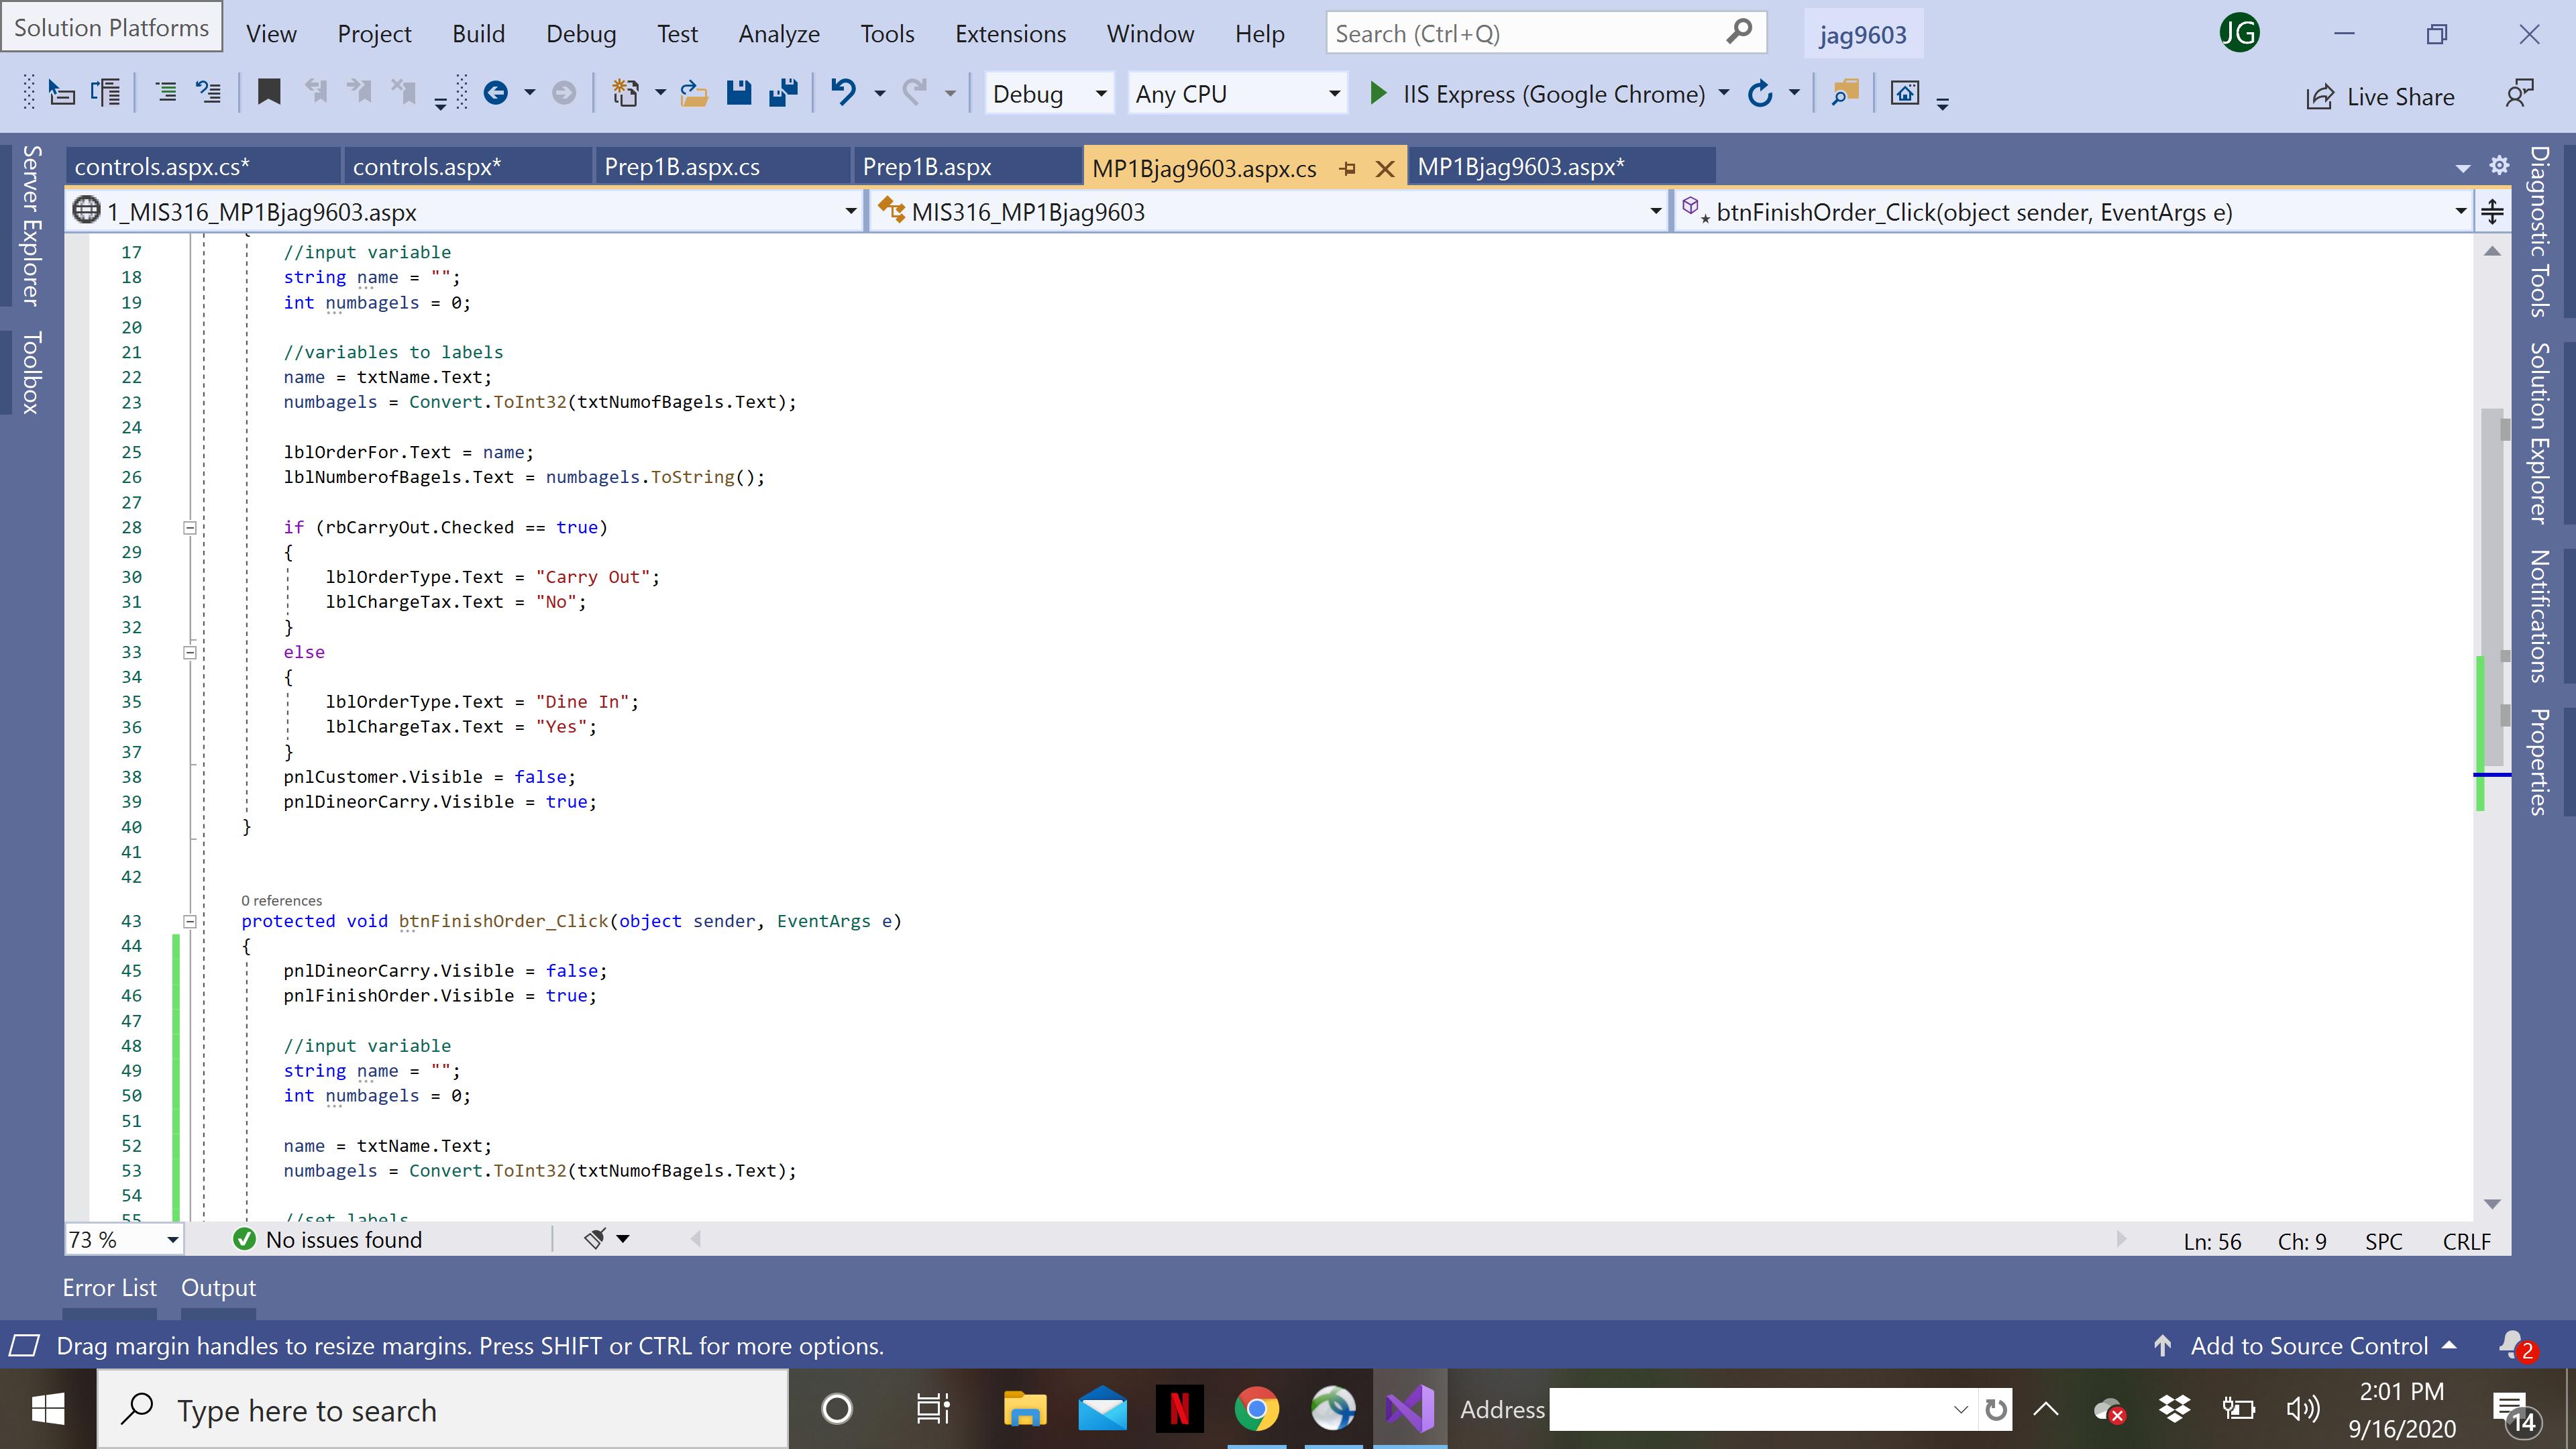 Screenshot 2020-09-16 14.01.55.png